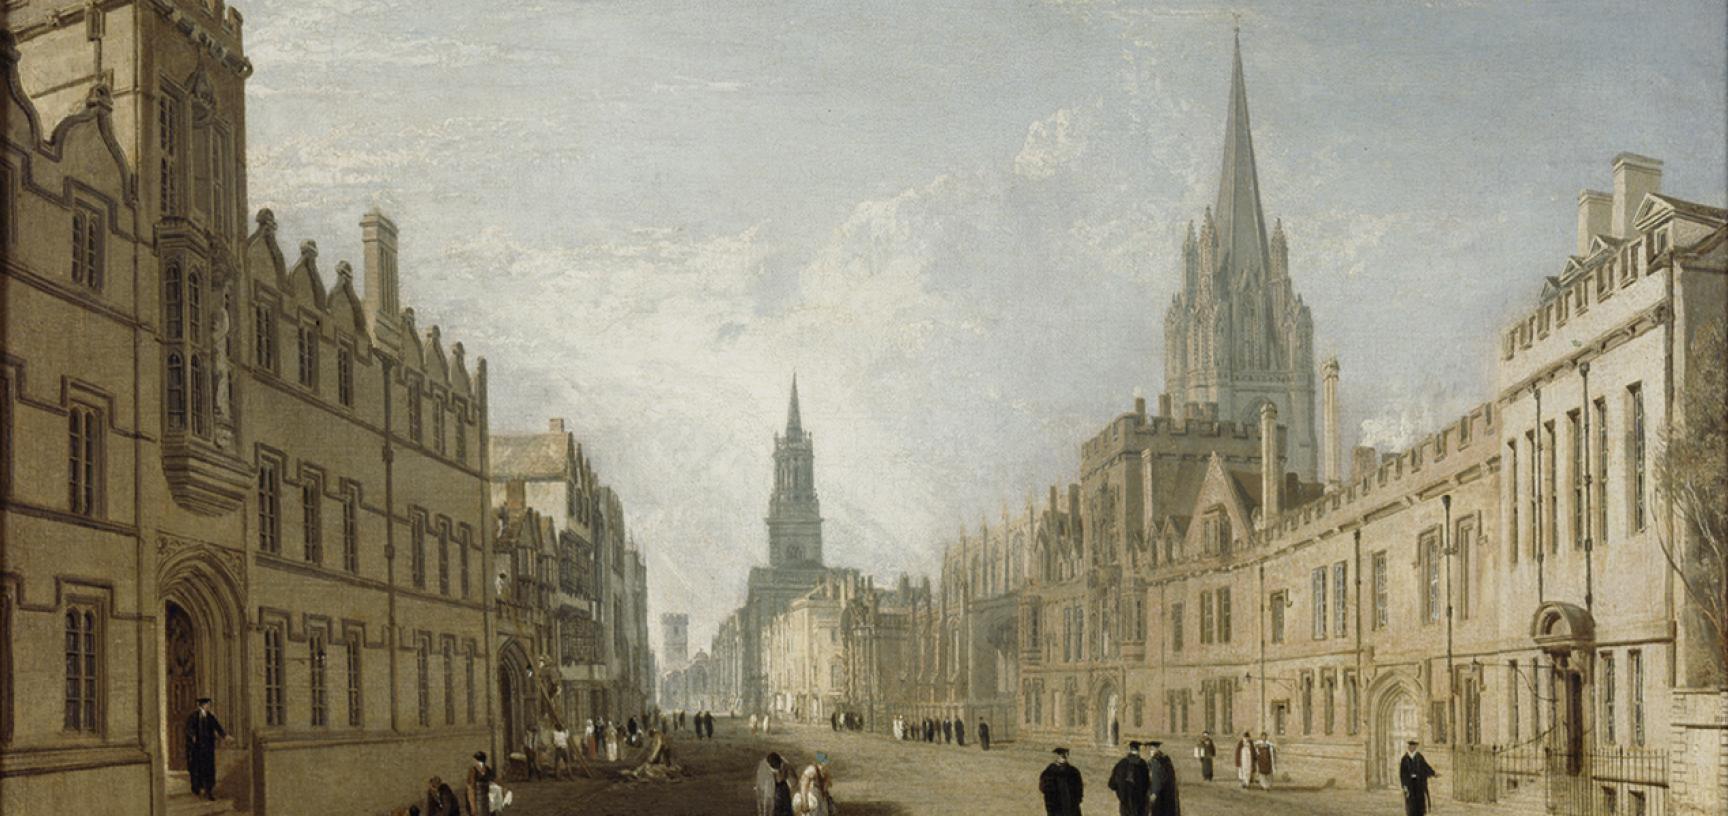 Turner's High Street by Joseph Mallord William Turner